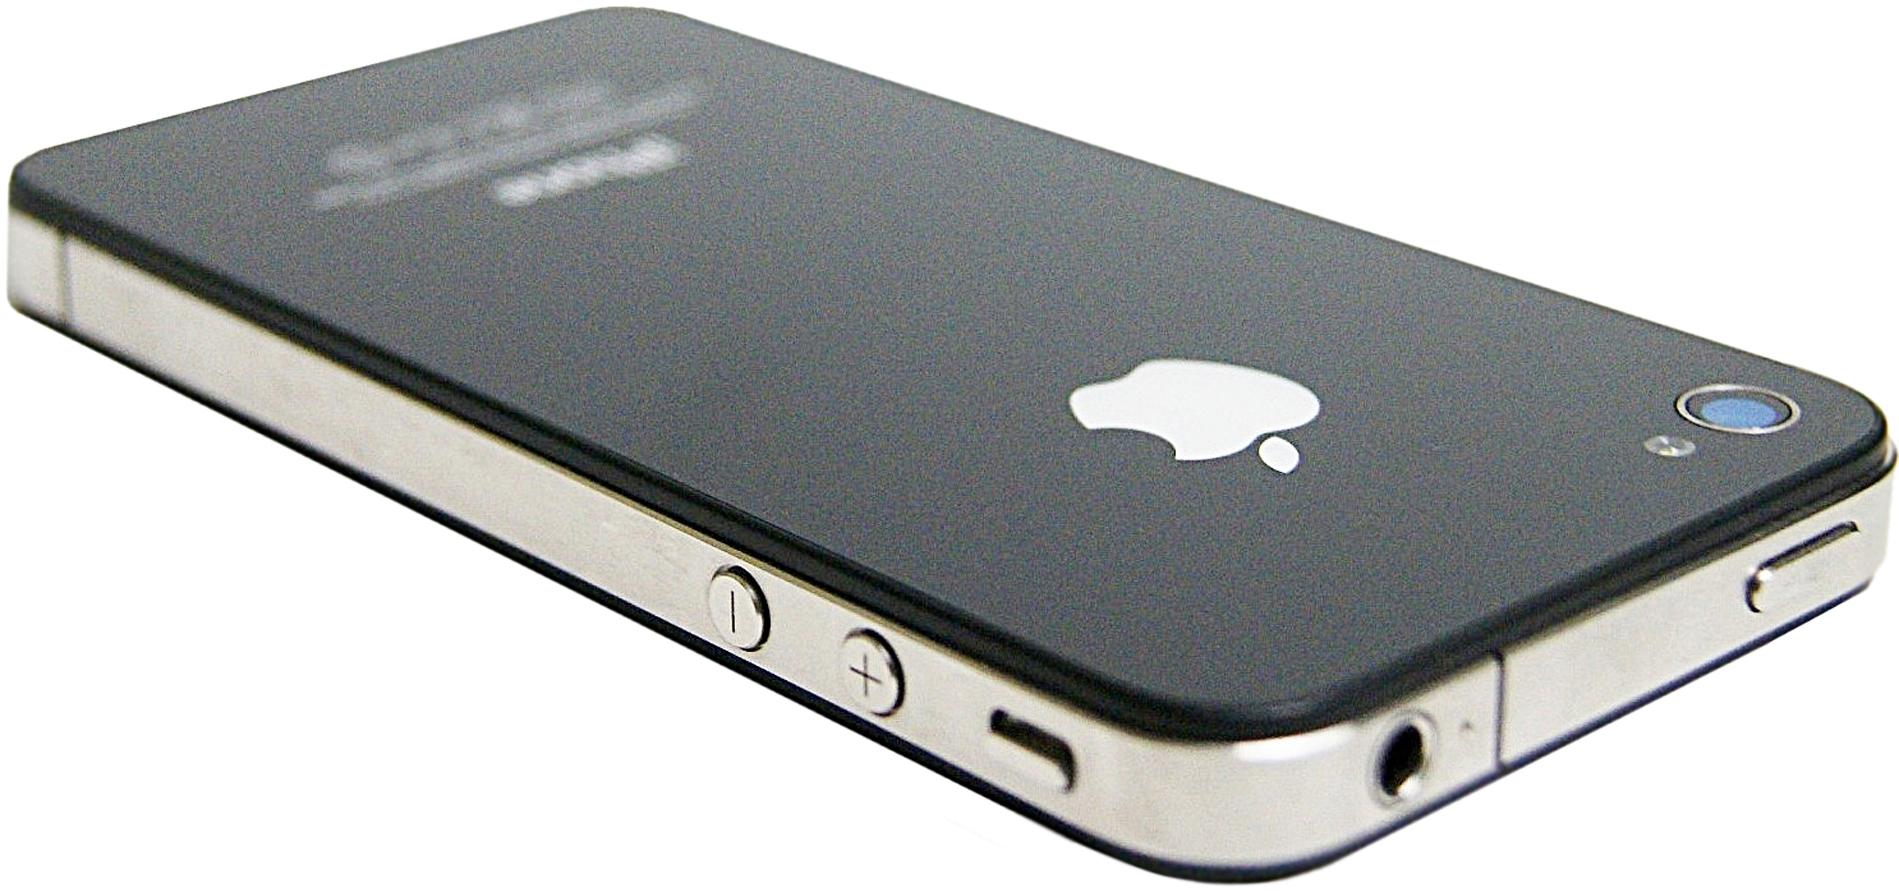 Инструкция по телефону iphone 4s